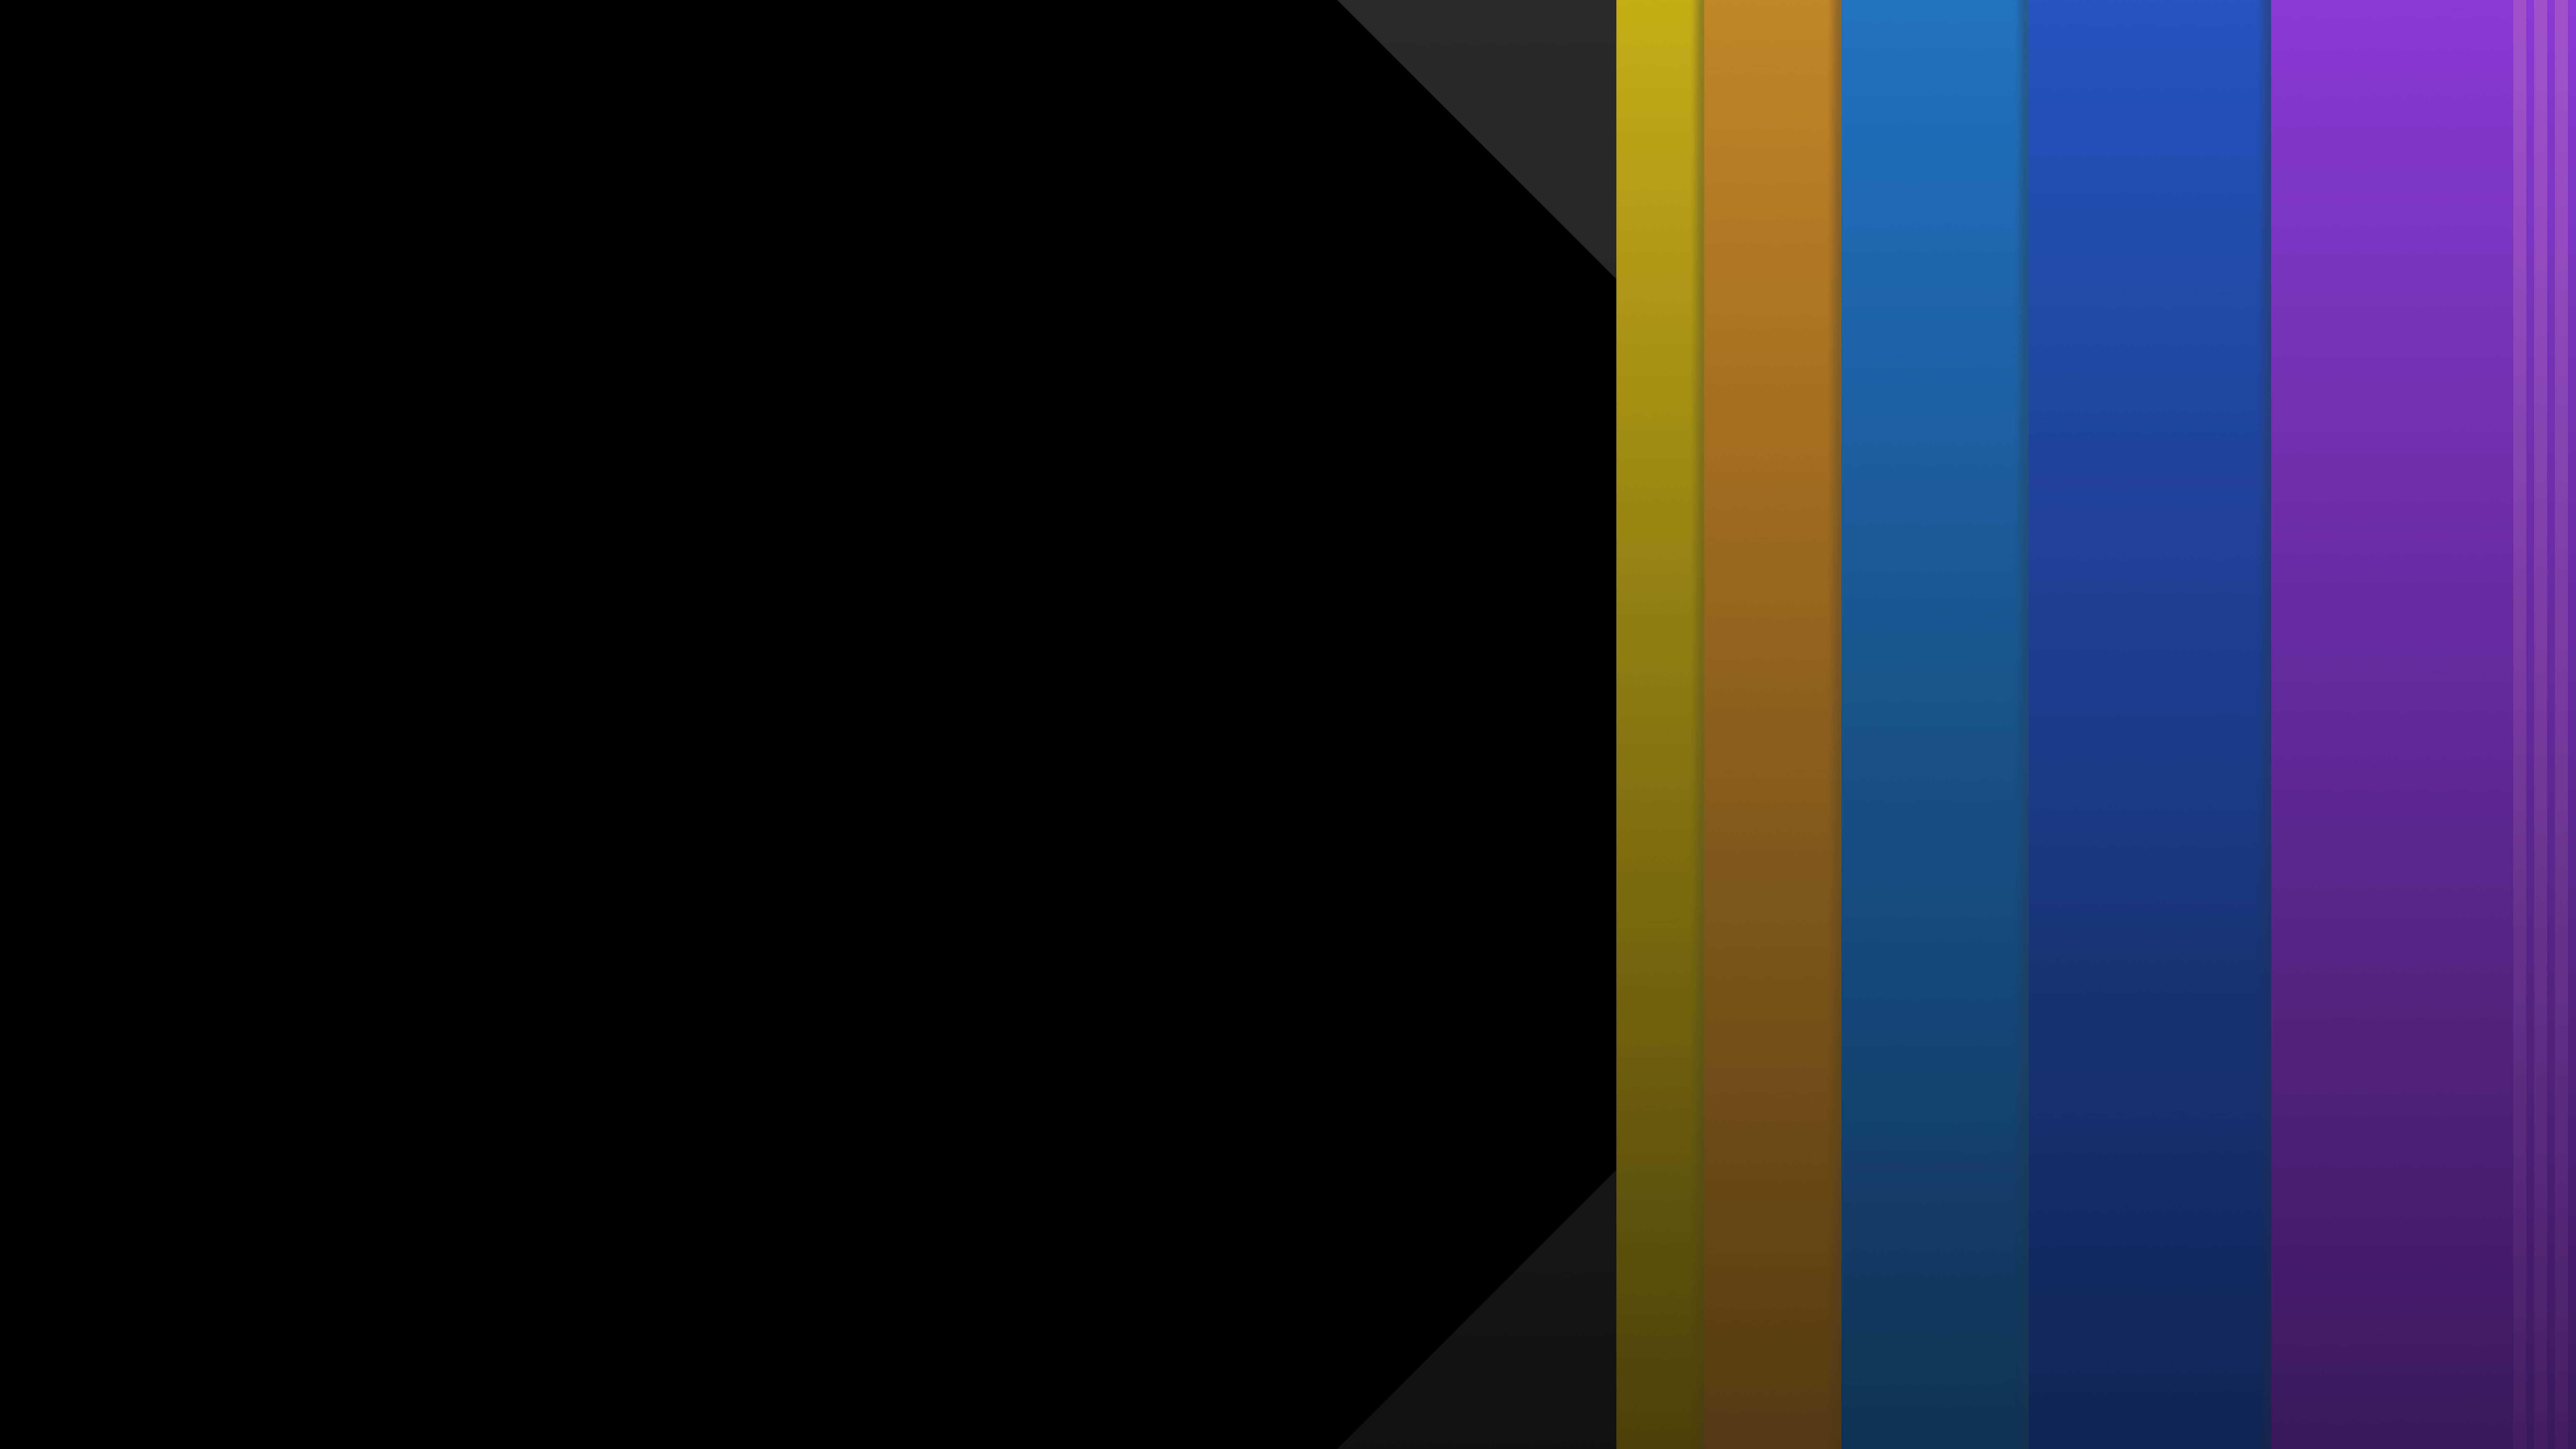 abstract minimalist colors uhd 8k wallpaper